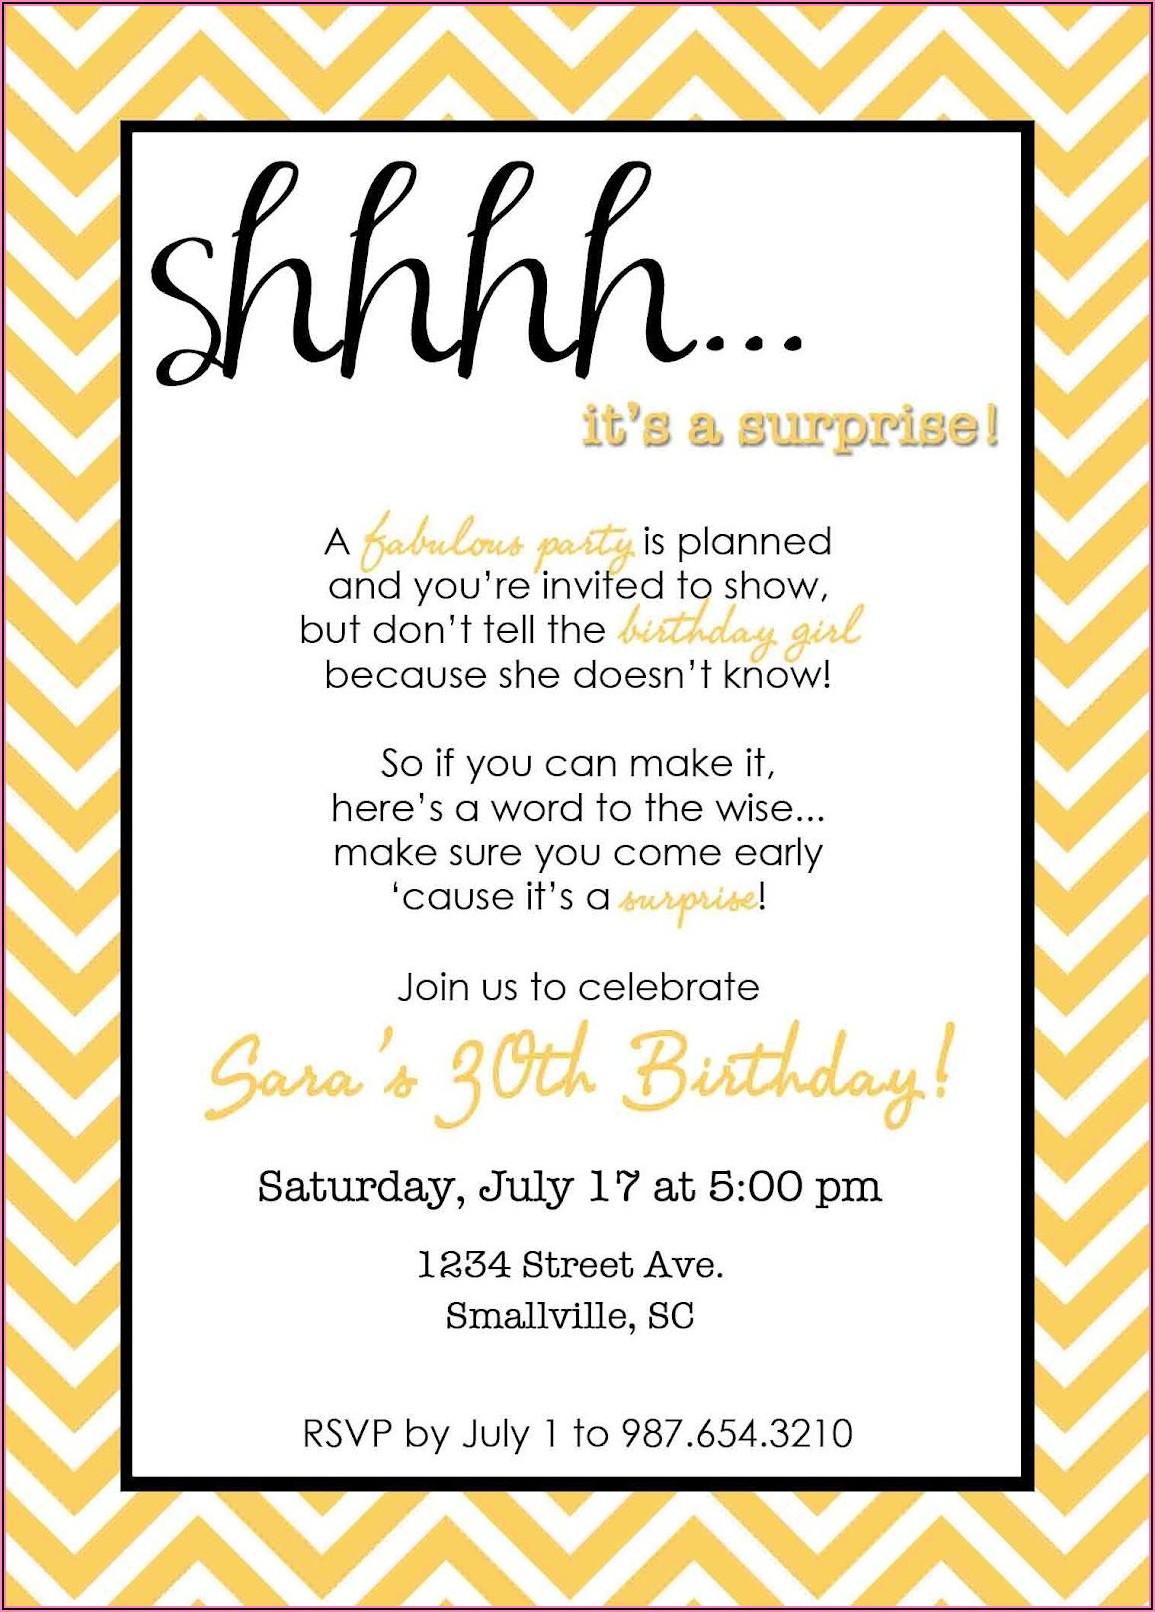 Surprise Birthday Party Invitations Wording